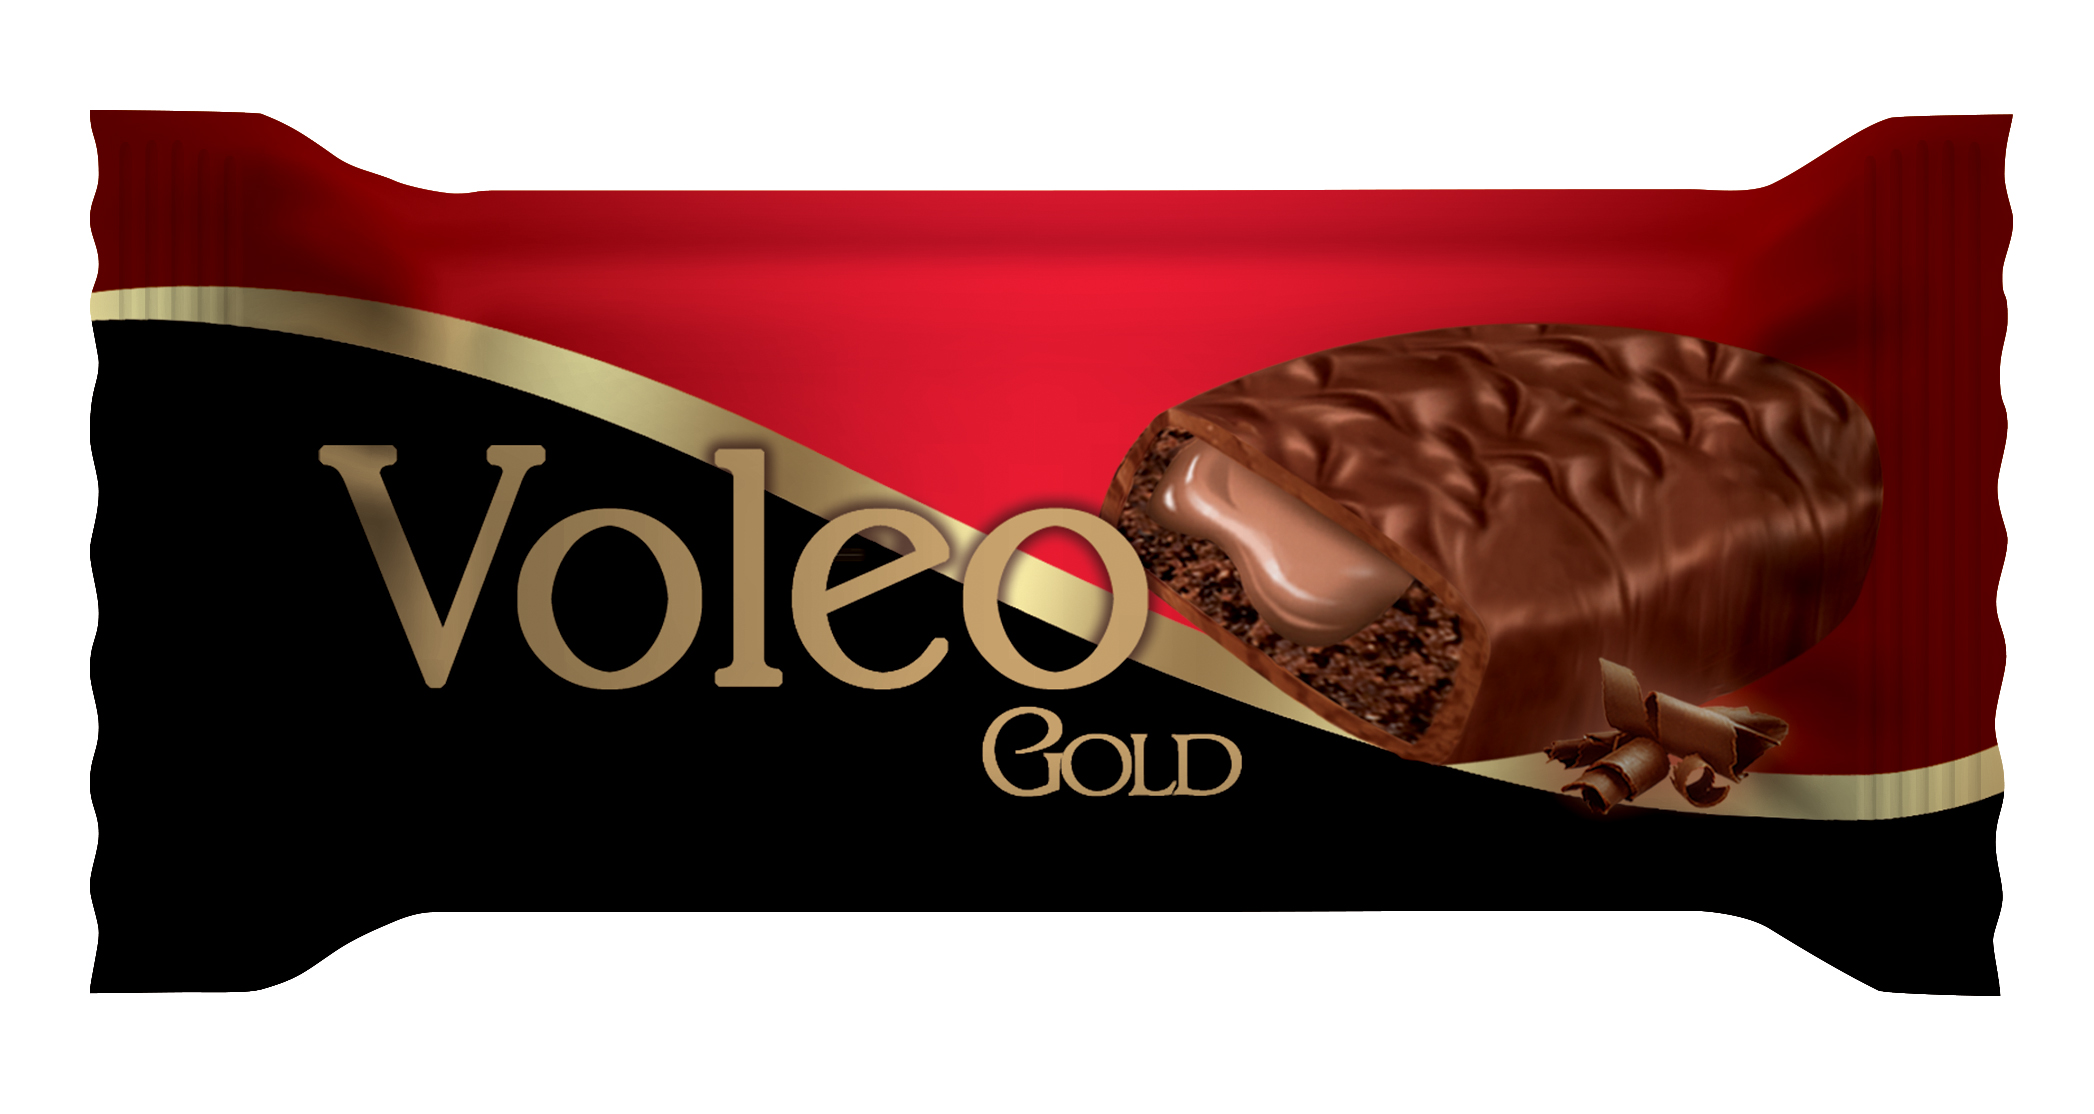 Voleo Gold